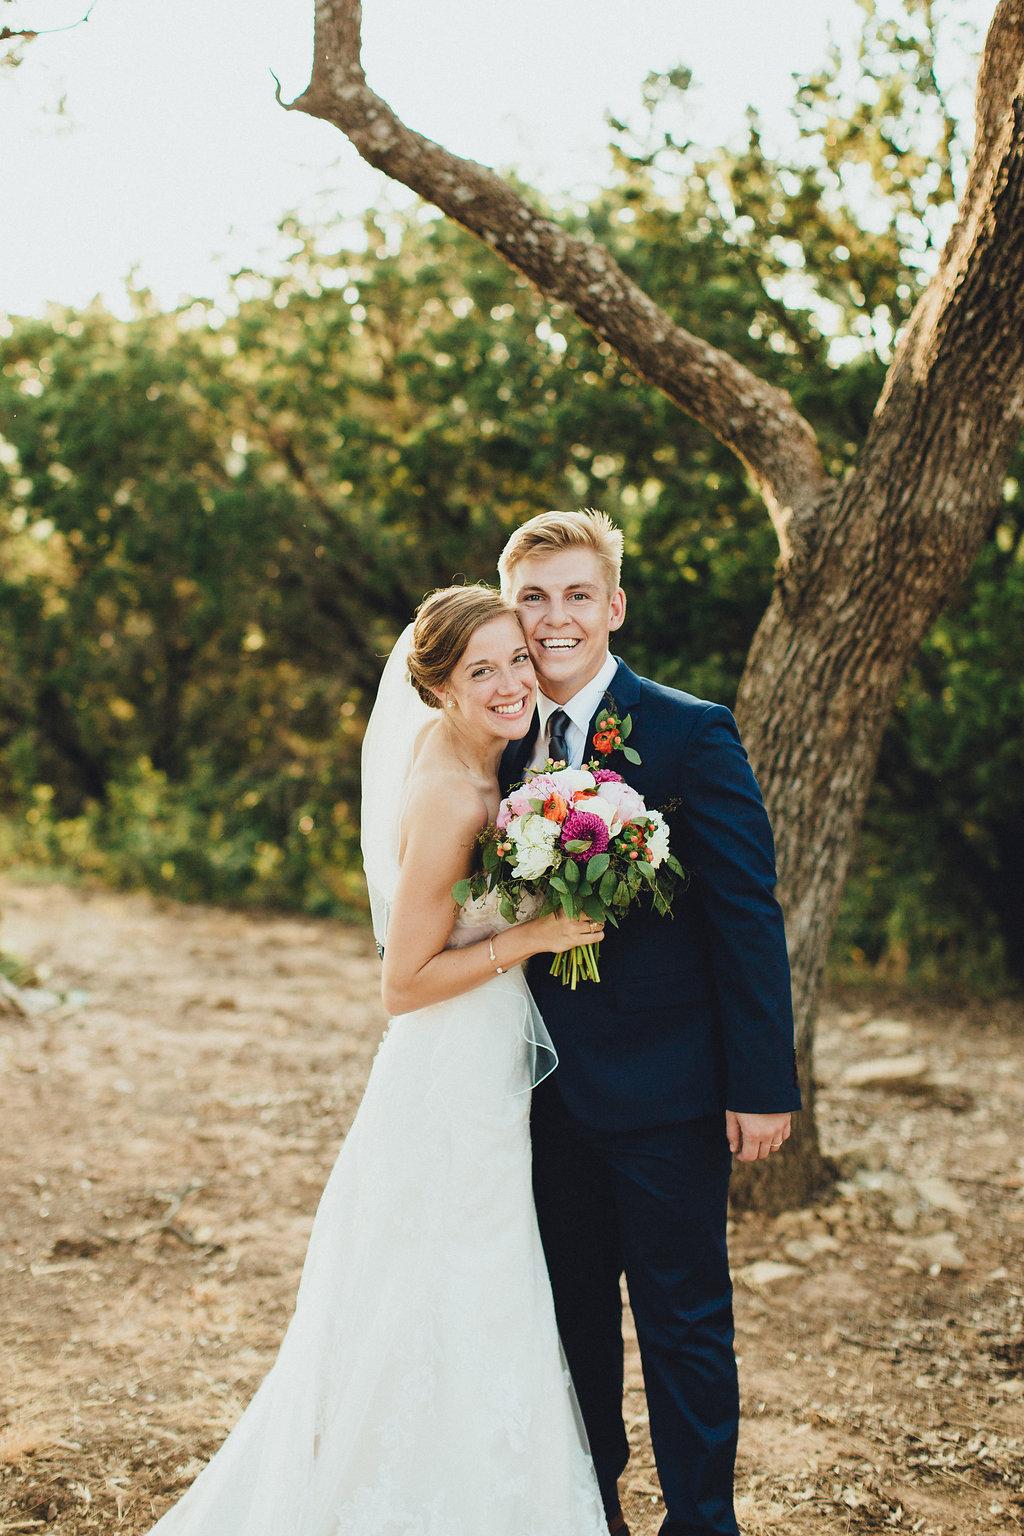 brian+annie_wedding-494.jpg